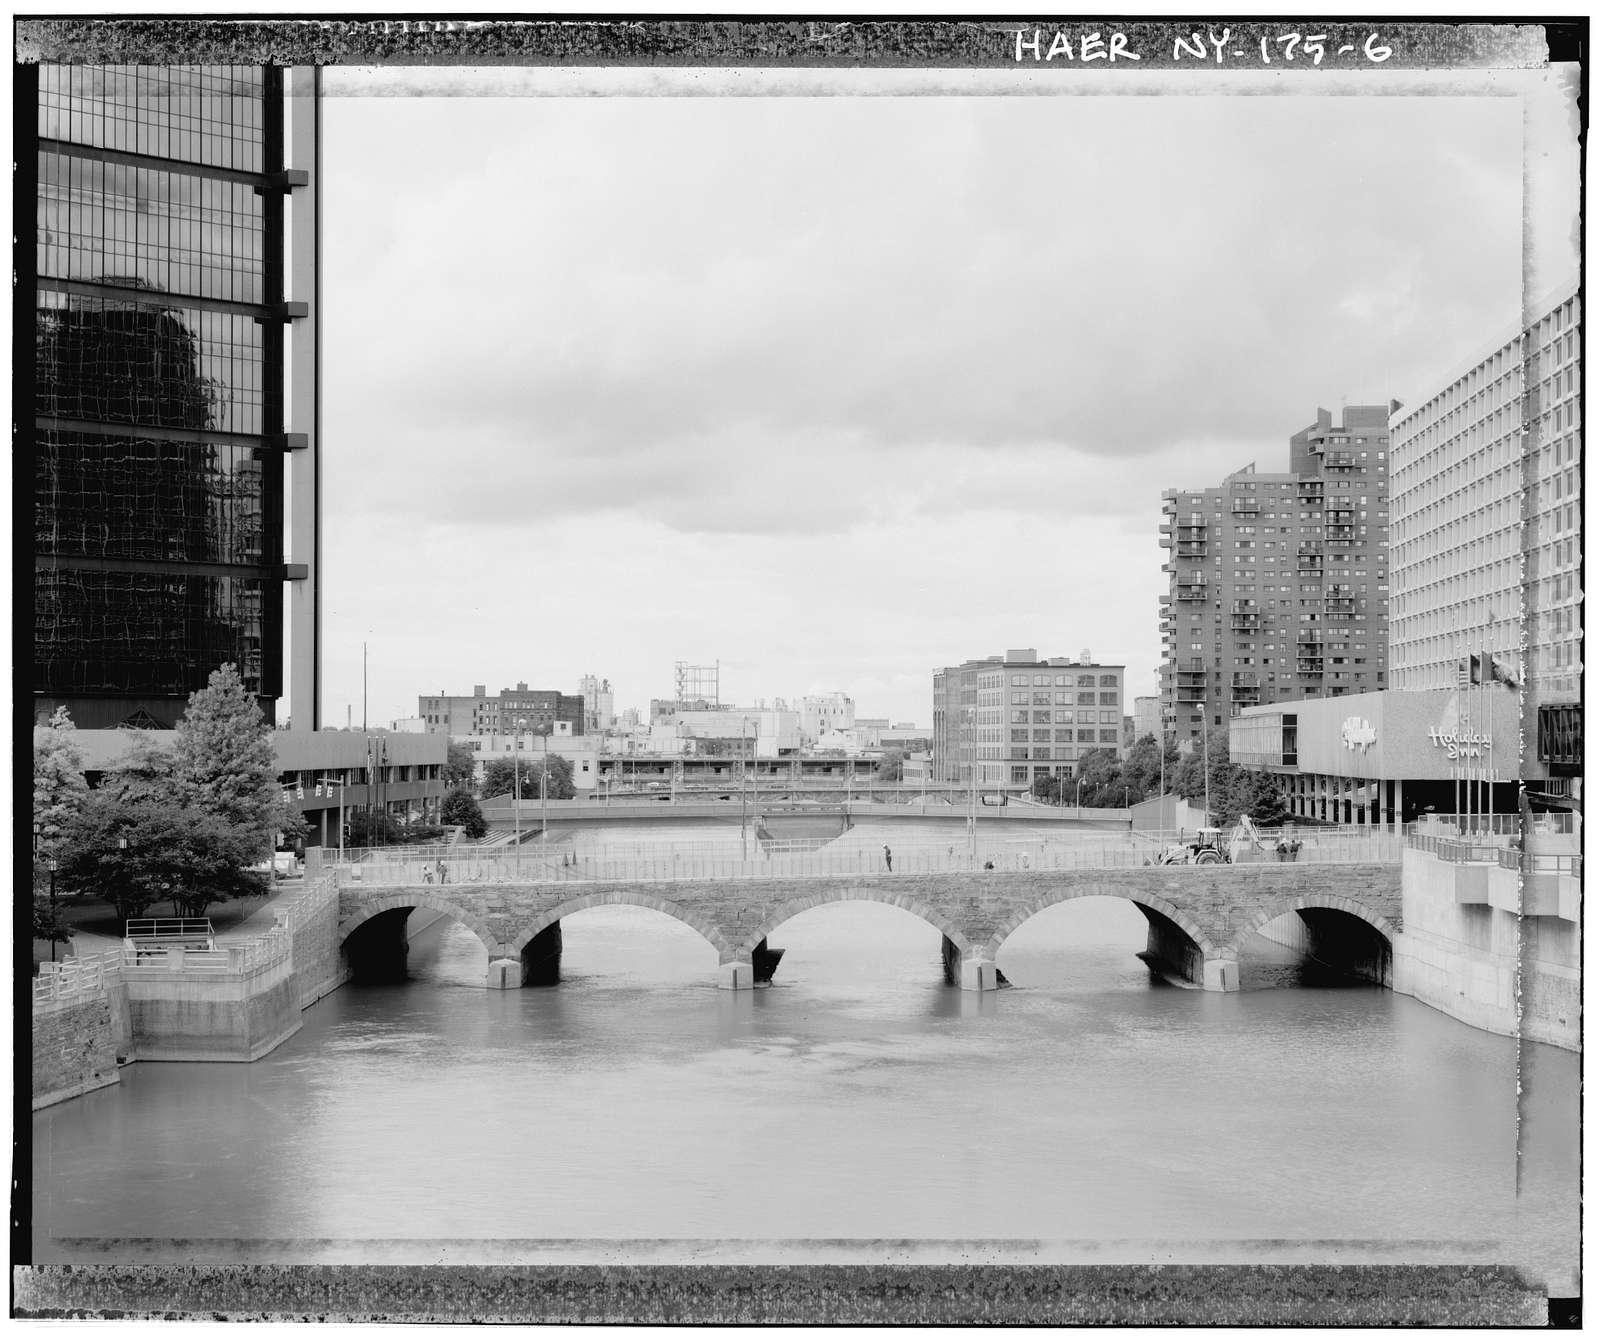 Main Street Bridge, Main Street East, spanning Genesee River, Rochester, Monroe County, NY